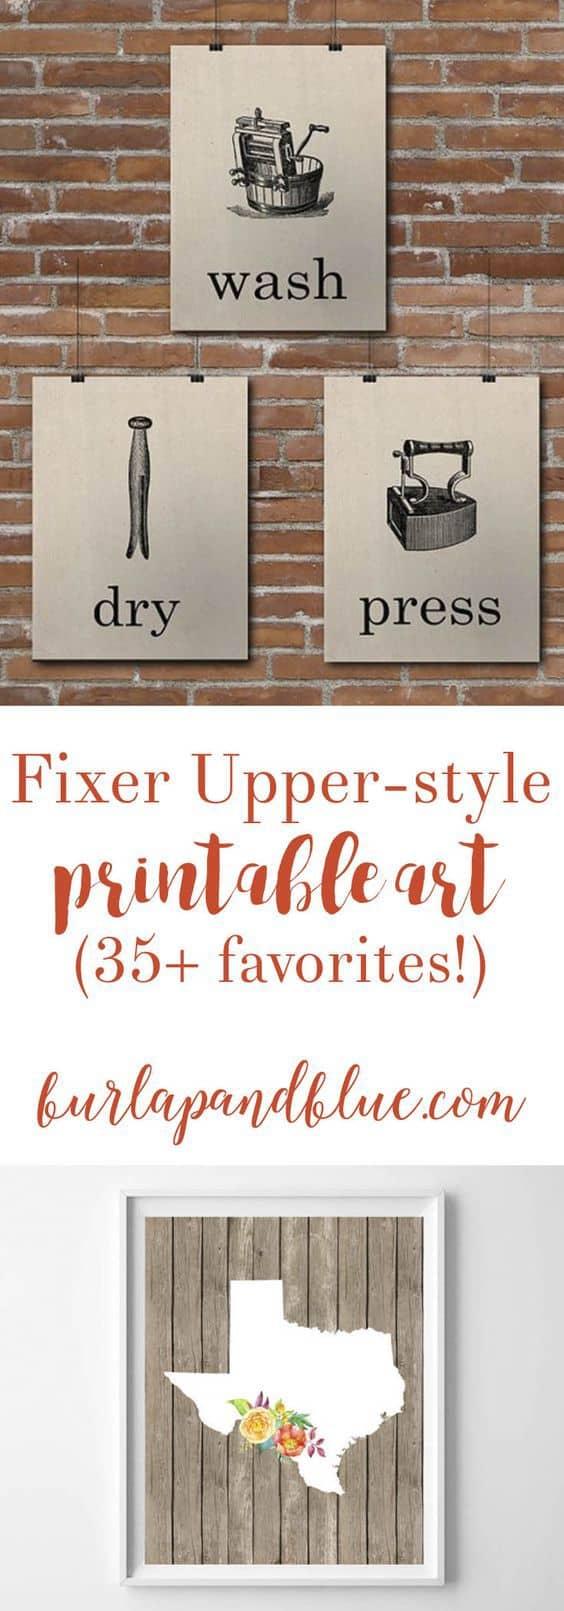 Wall Art Ideas Inspired By Fixer Upper